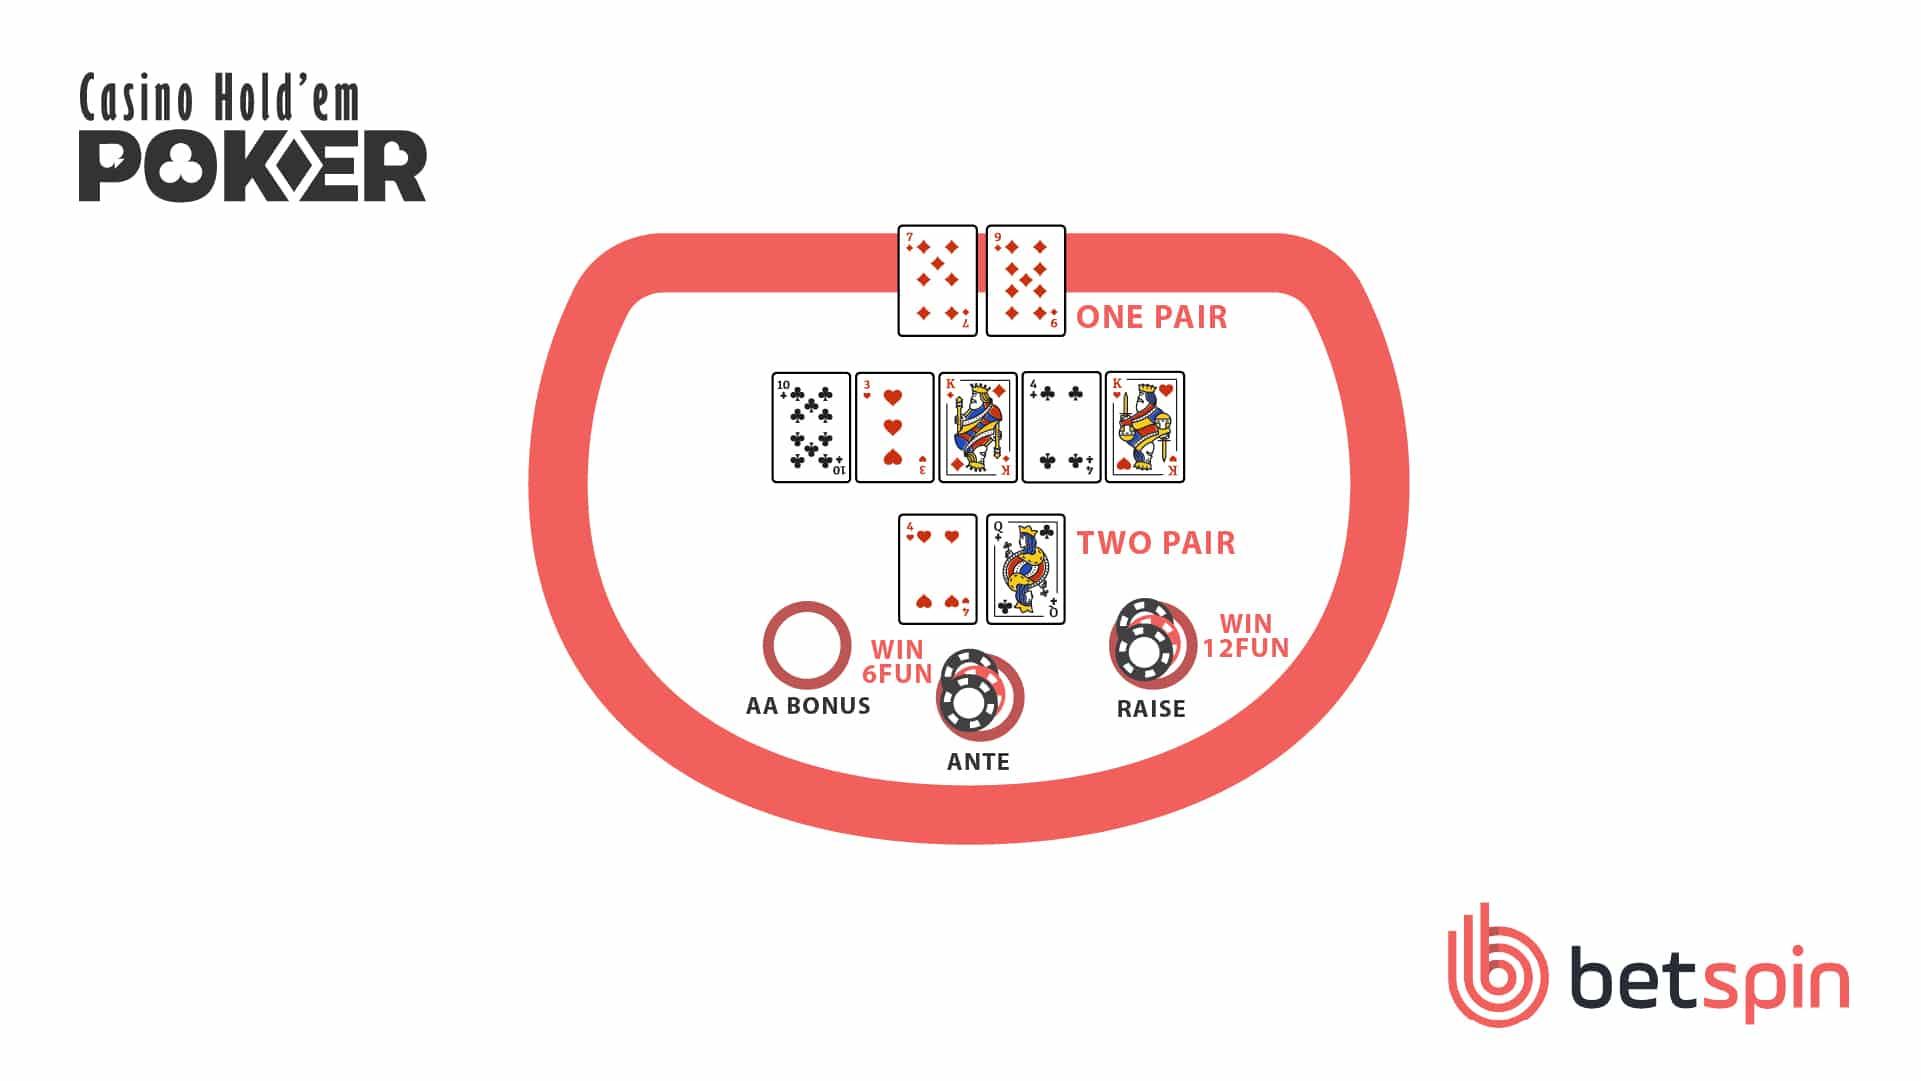 Casino Holdem Step 5